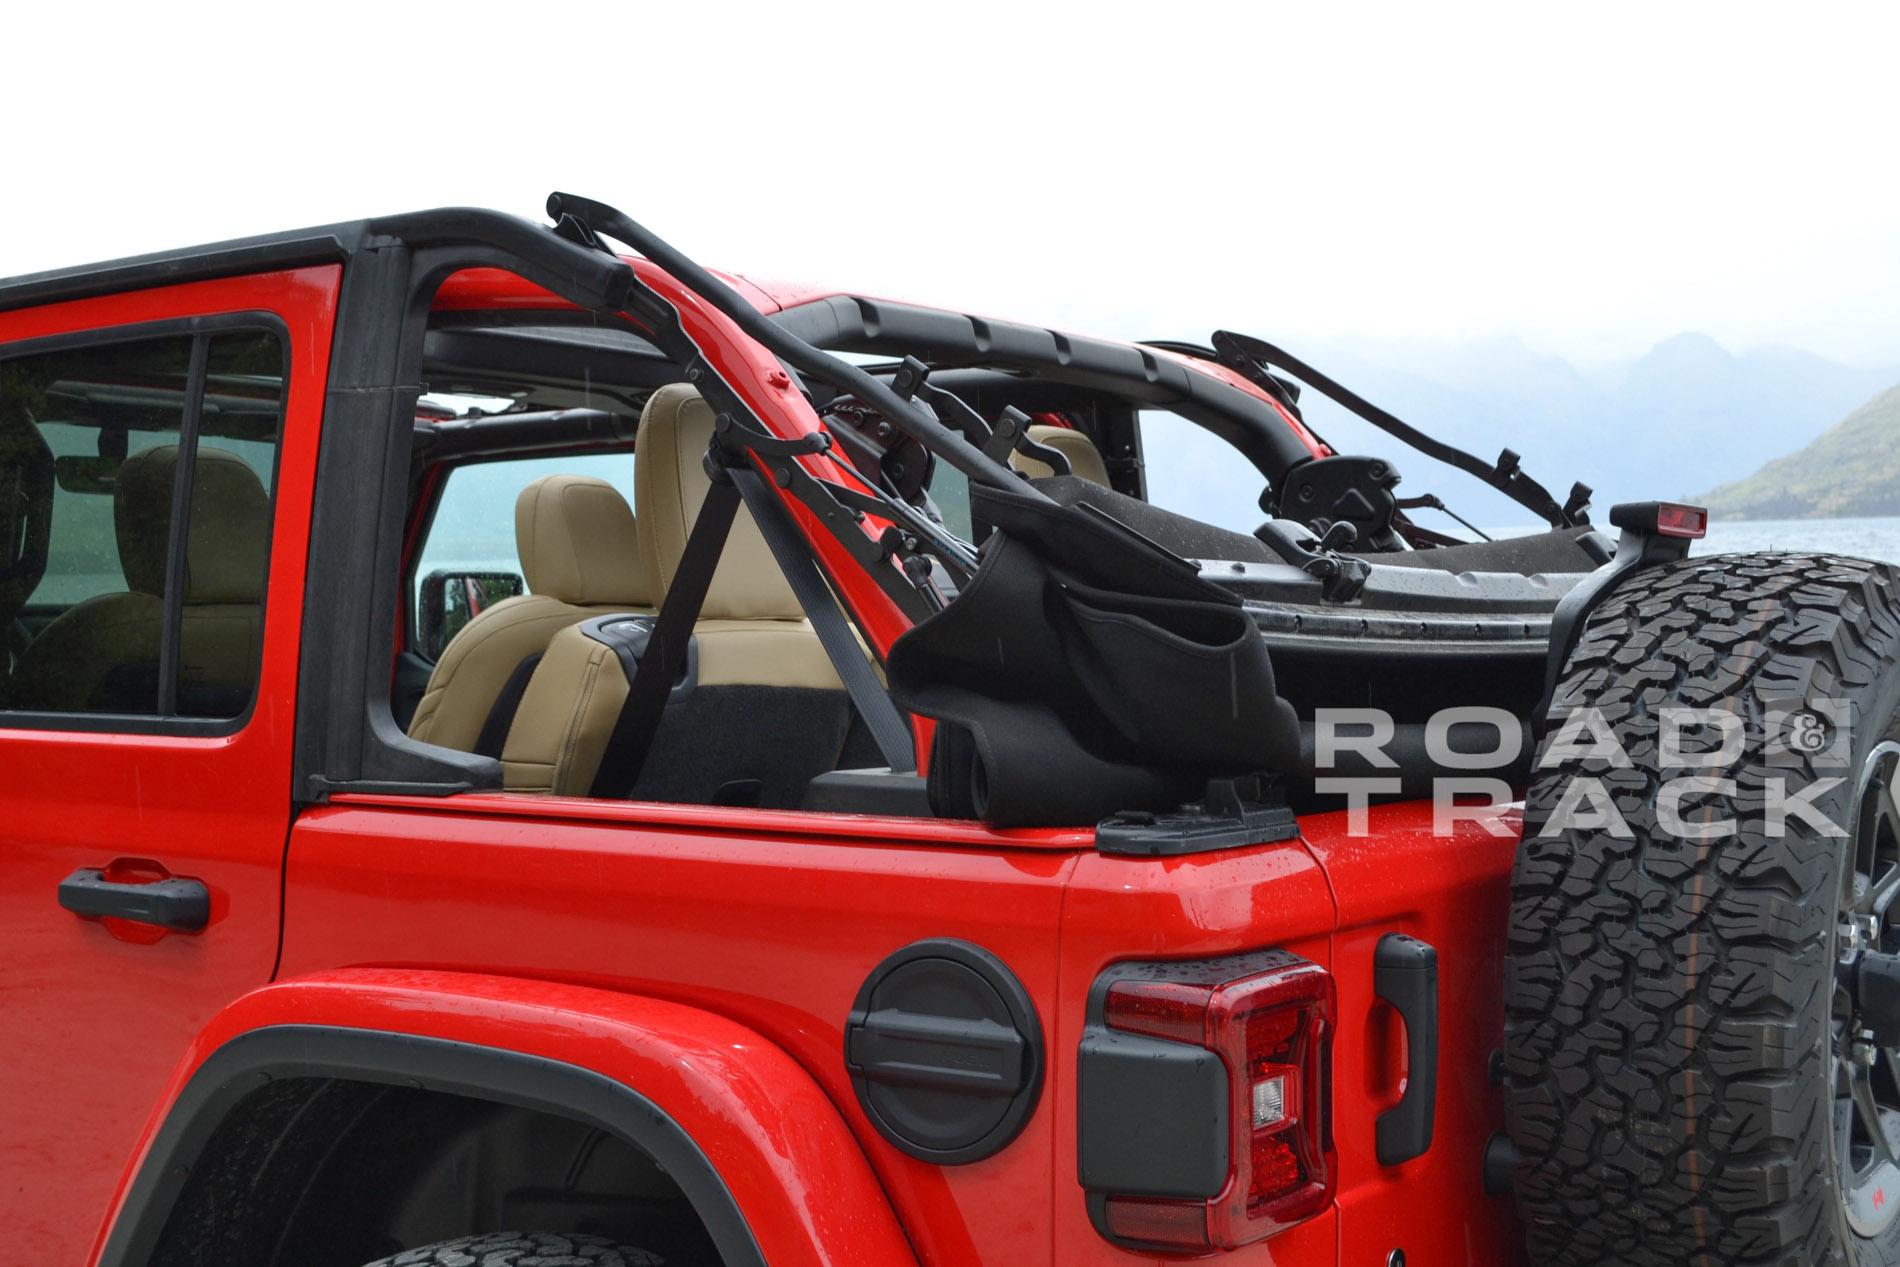 JL Wrangler Interior Photos 2018 Jeep Wrangler Forums